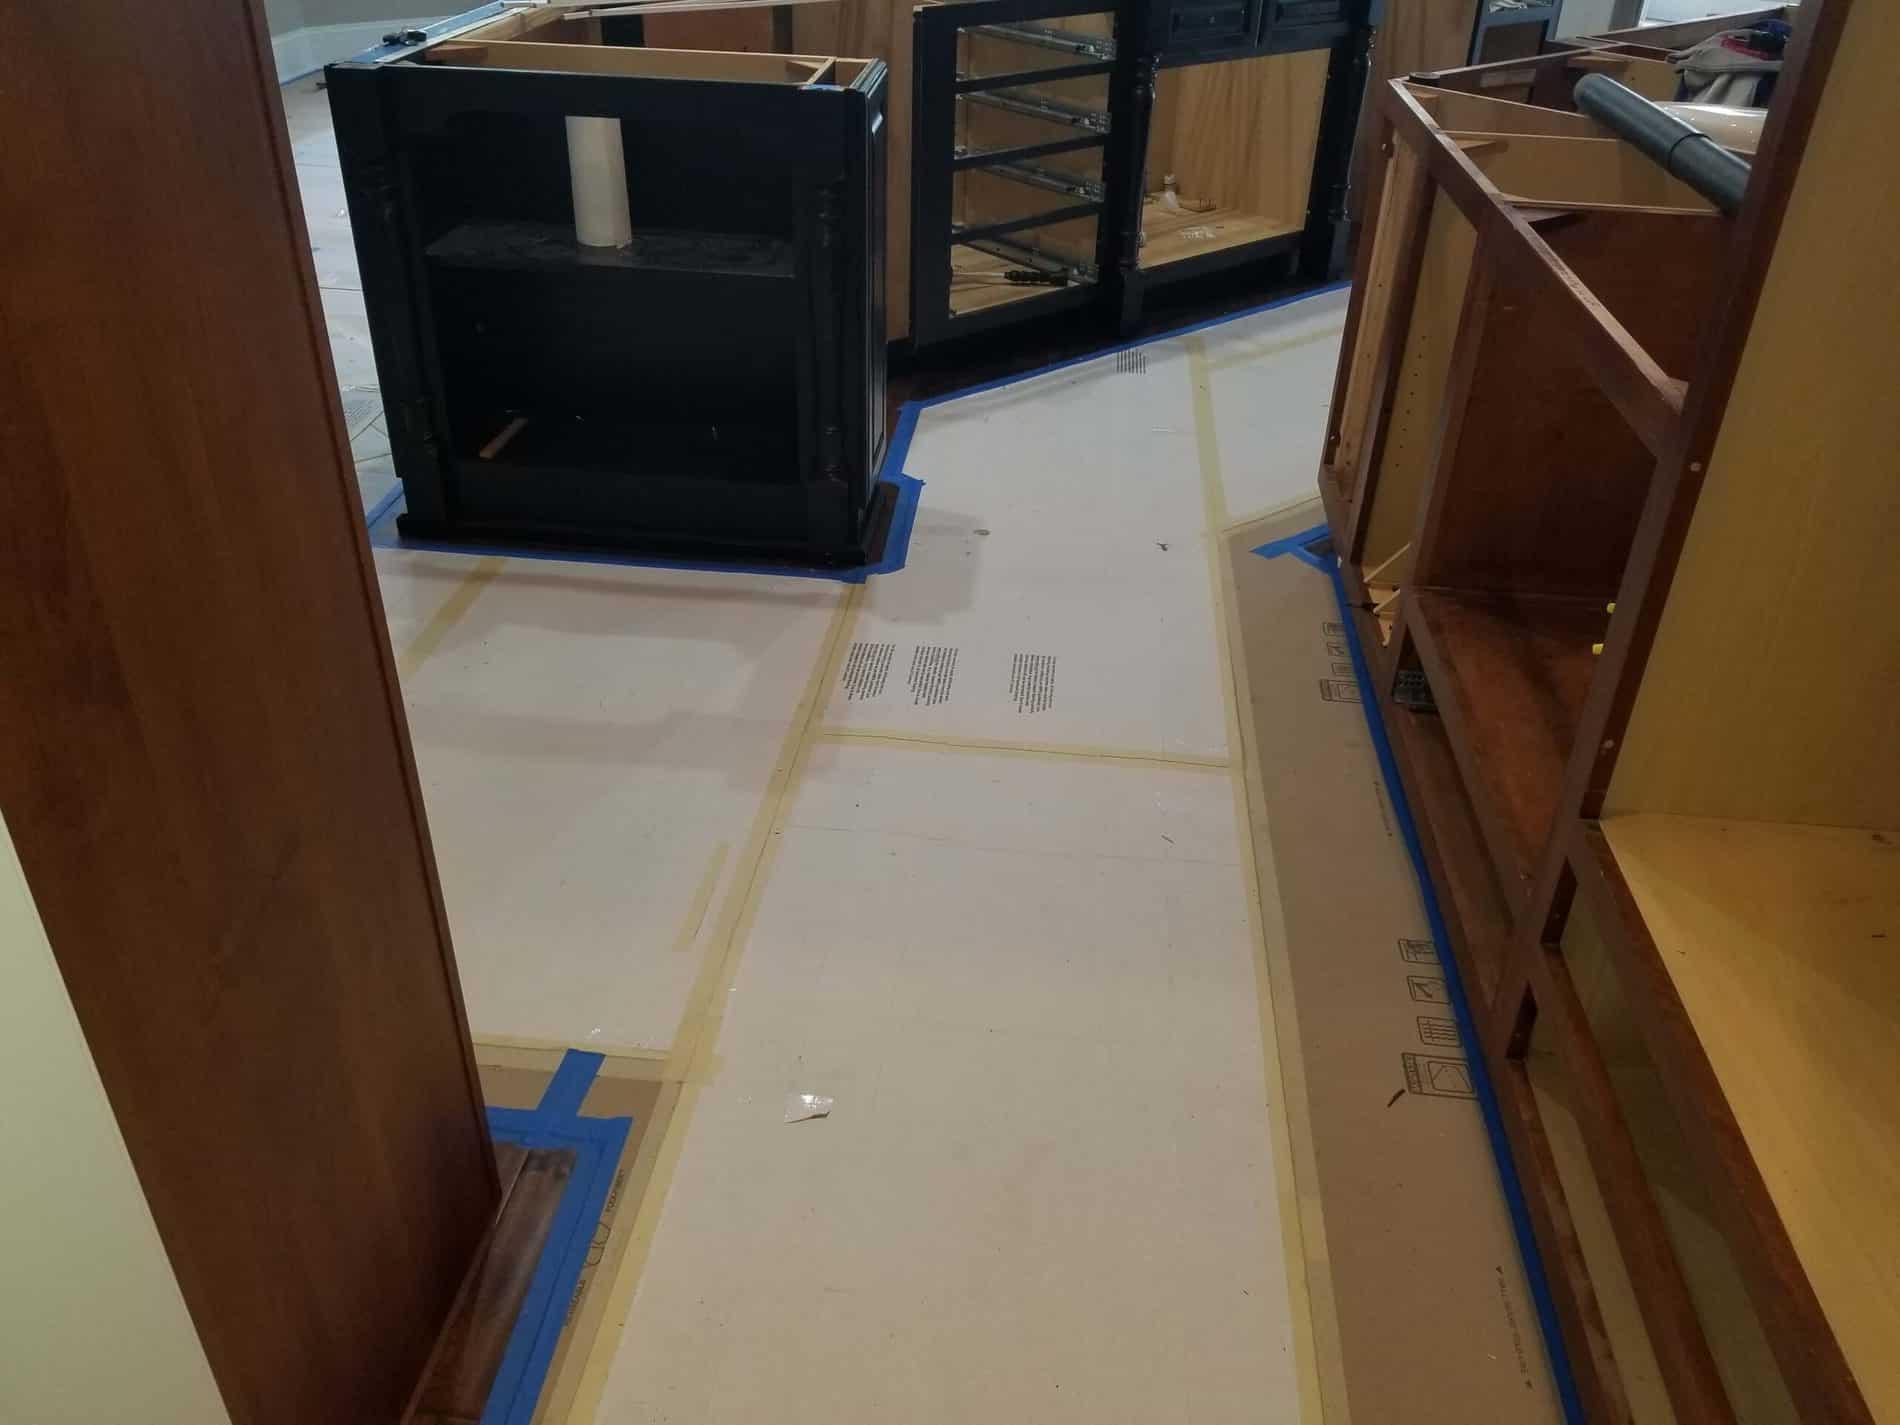 Kitchen Restoration from Water Damage in South Charleston